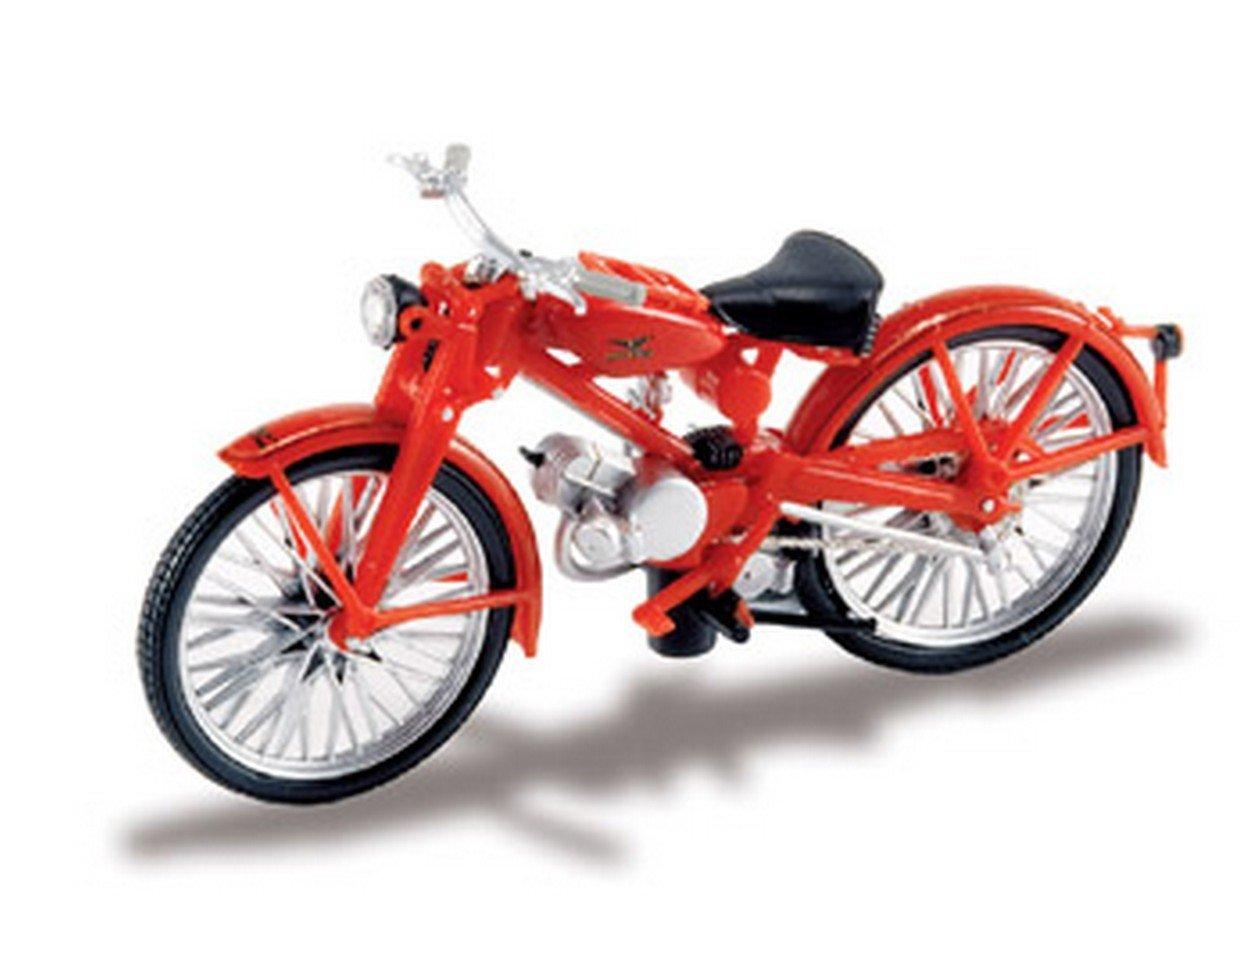 Moto Guzzi === modelo 1:24 === Motorcycle StarLine === motoleggera